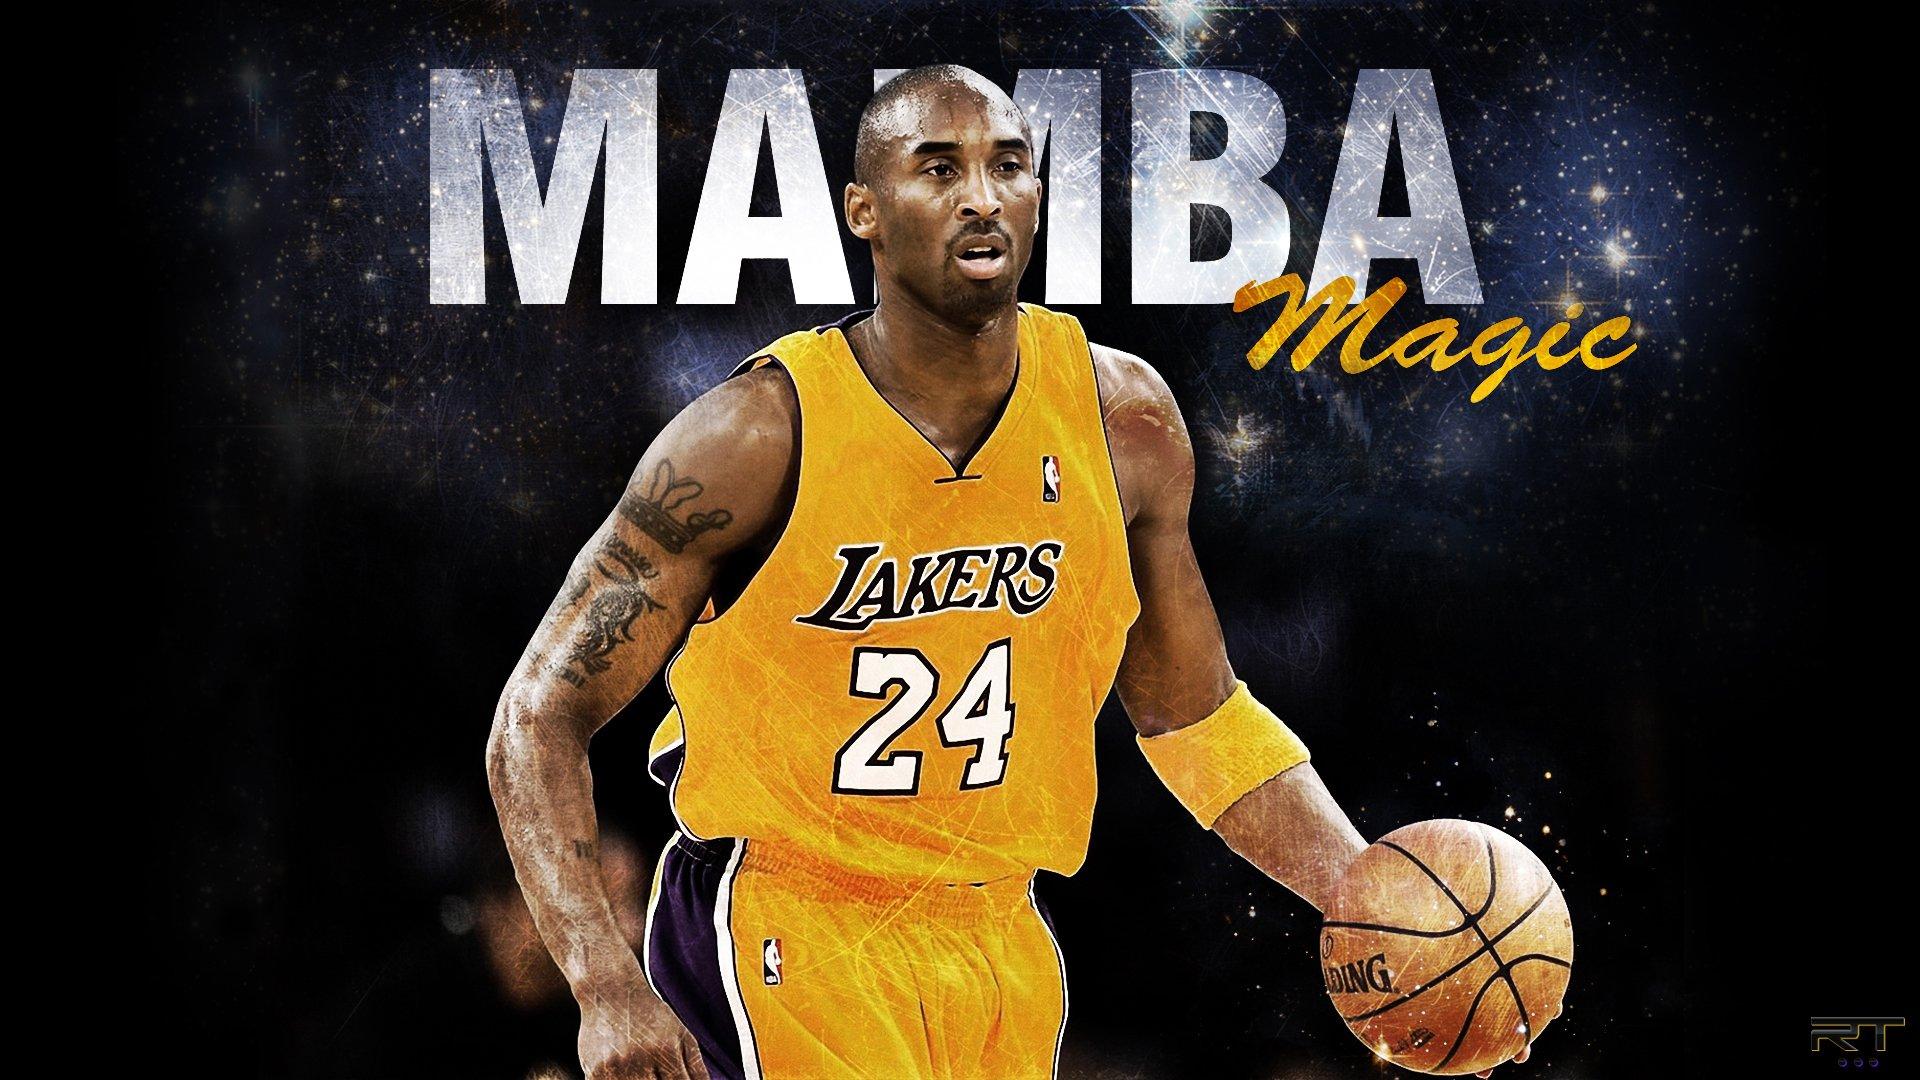 Kobe Bryant RIP Messages Floods Twitter Trends RIPMamba is No 1 1920x1080